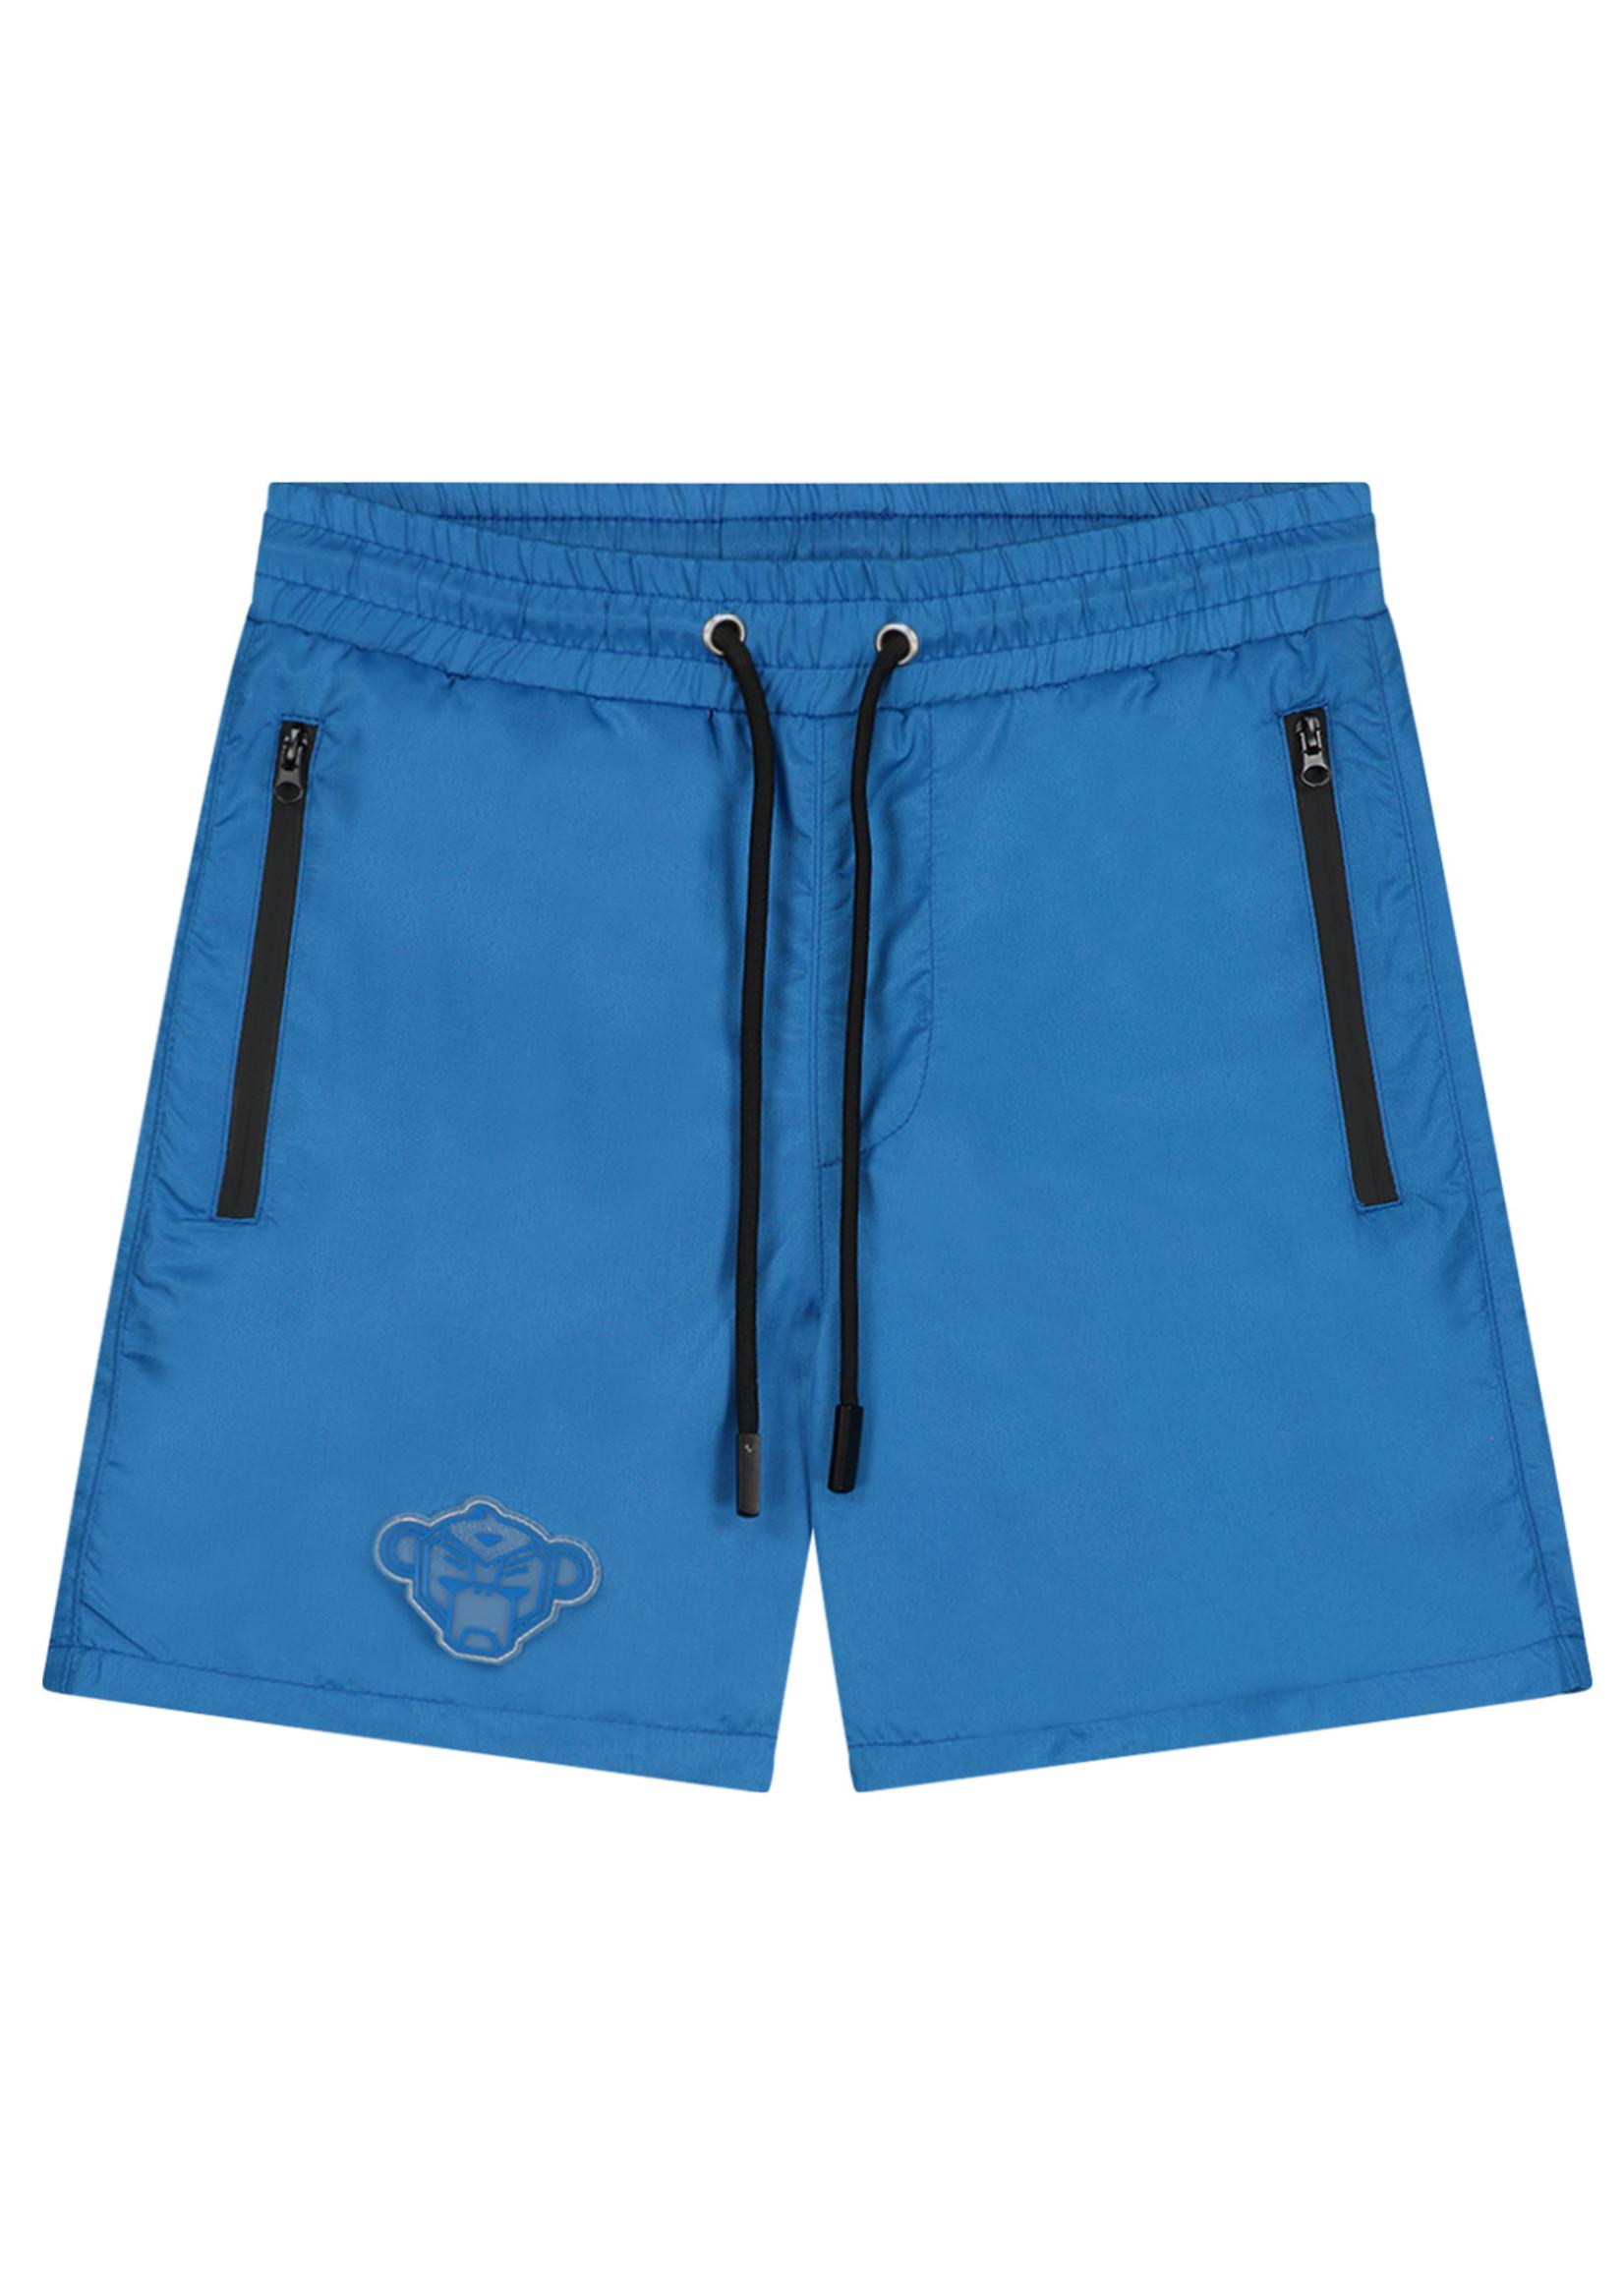 Black Bananas BlackBananas Jr. Patchy Swimshort blue